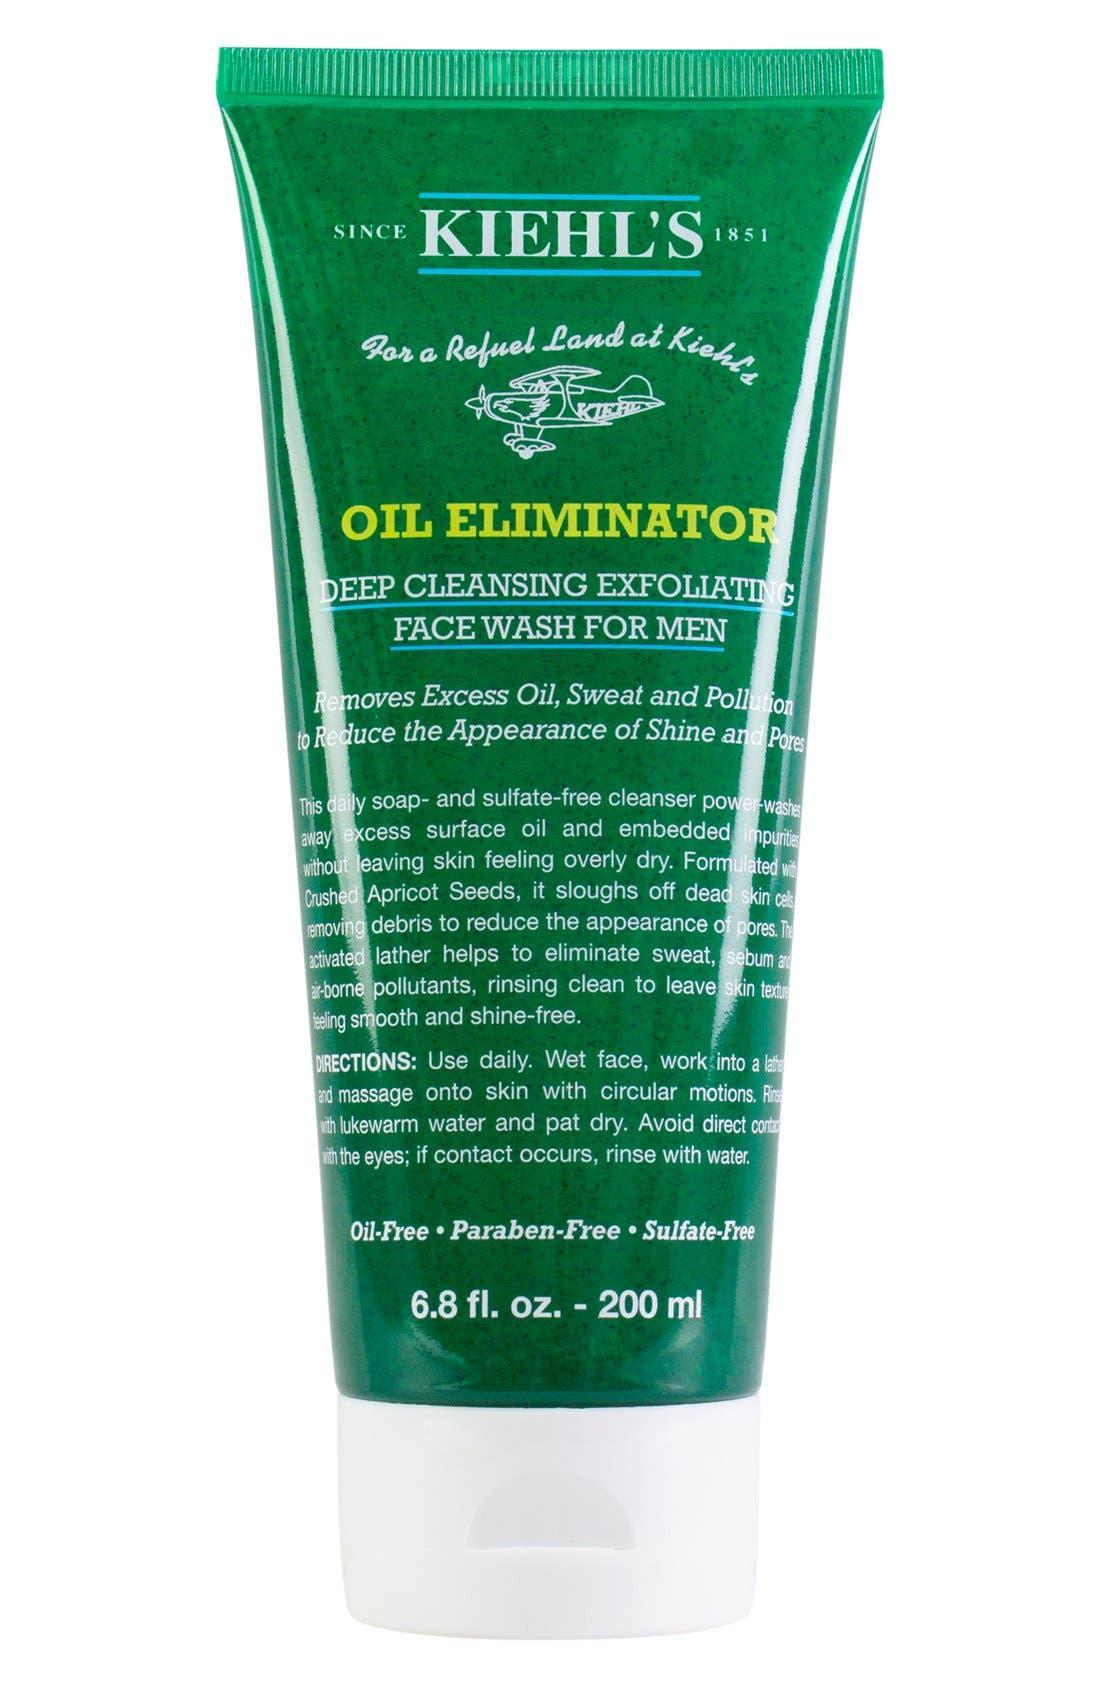 'Oil Eliminator' Deep Cleansing Exfoliating Face Wash for Men,                             Main thumbnail 1, color,                             NO COLOR